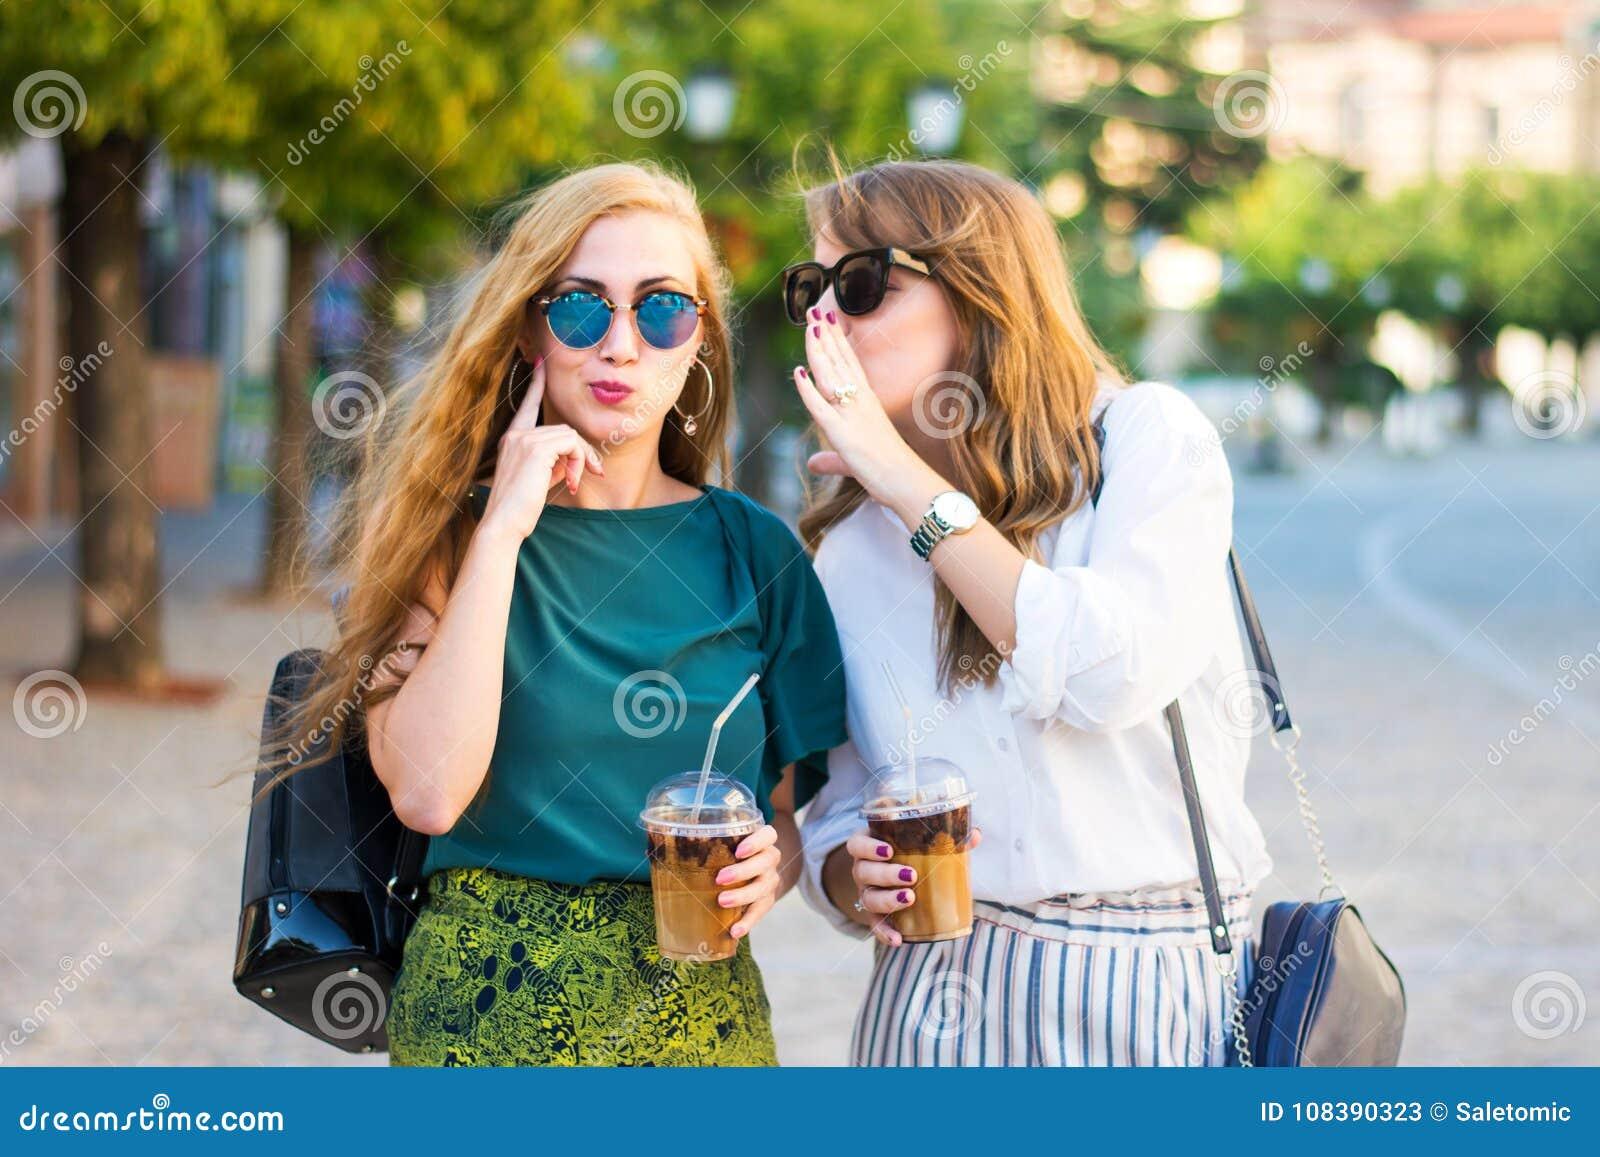 Happy Gossip Girls Walking In The City Stock Image - Image